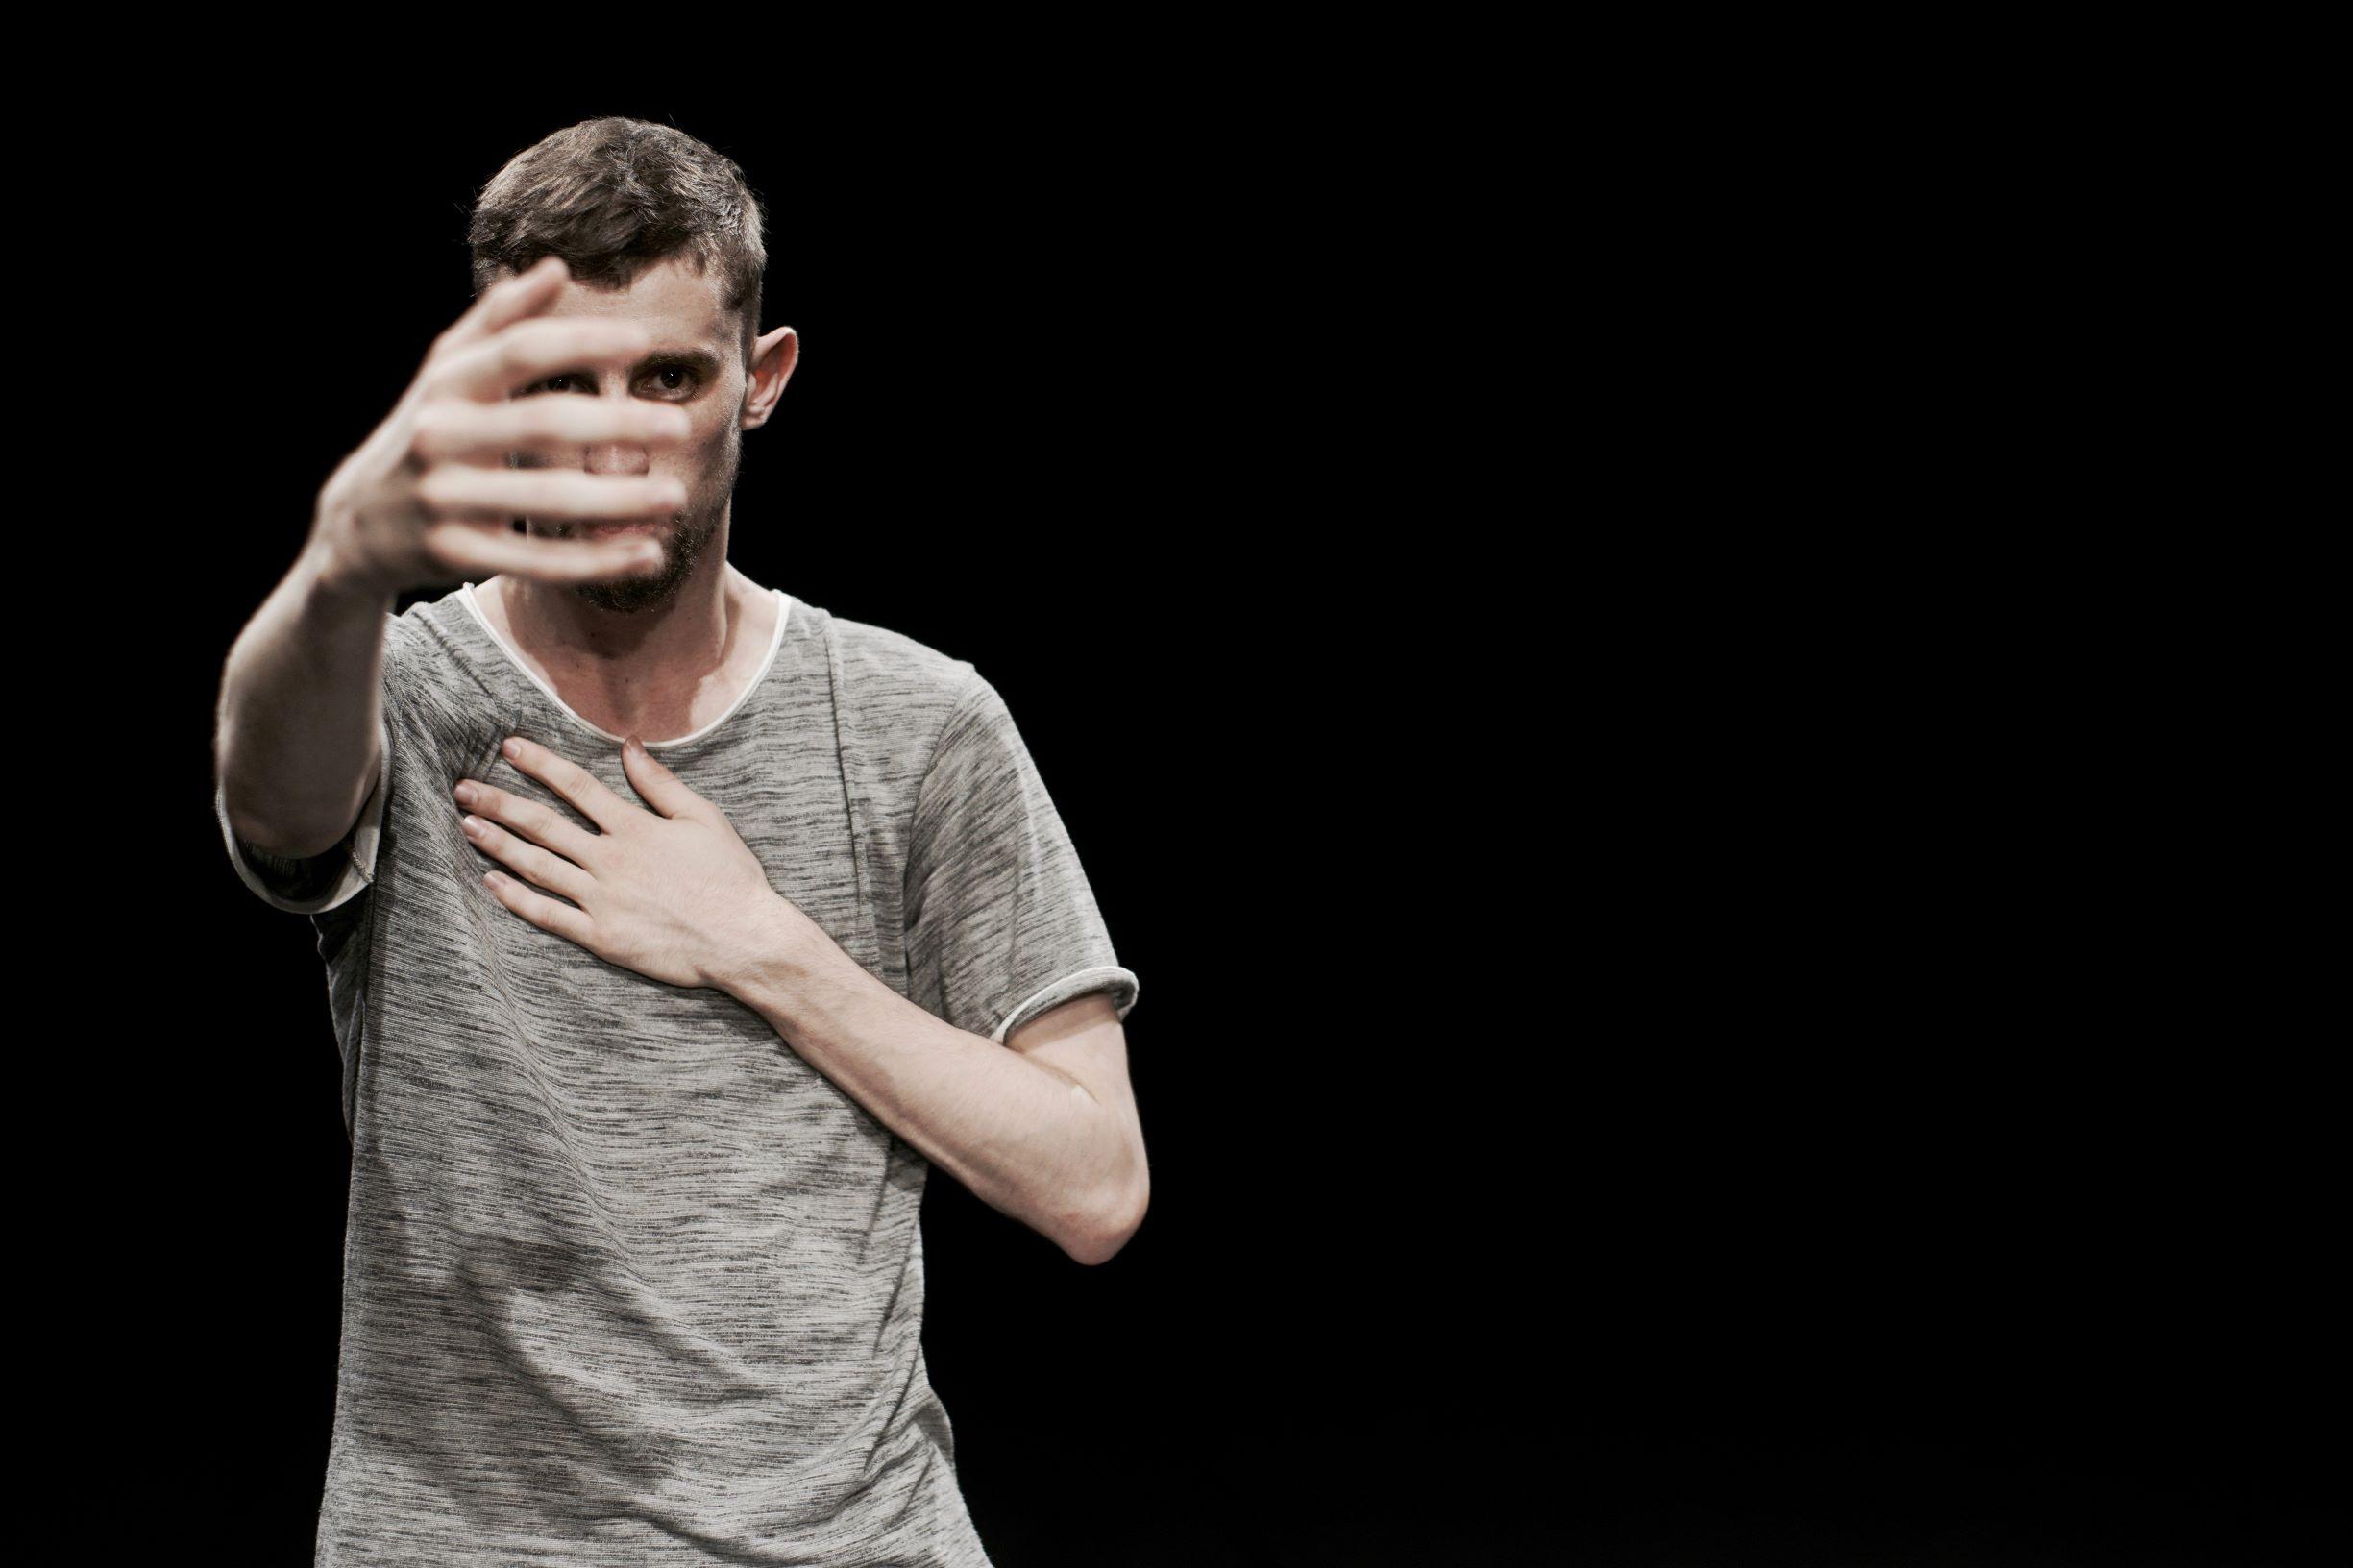 COMPANHIA PAULO RIBEIRO / A solo for society